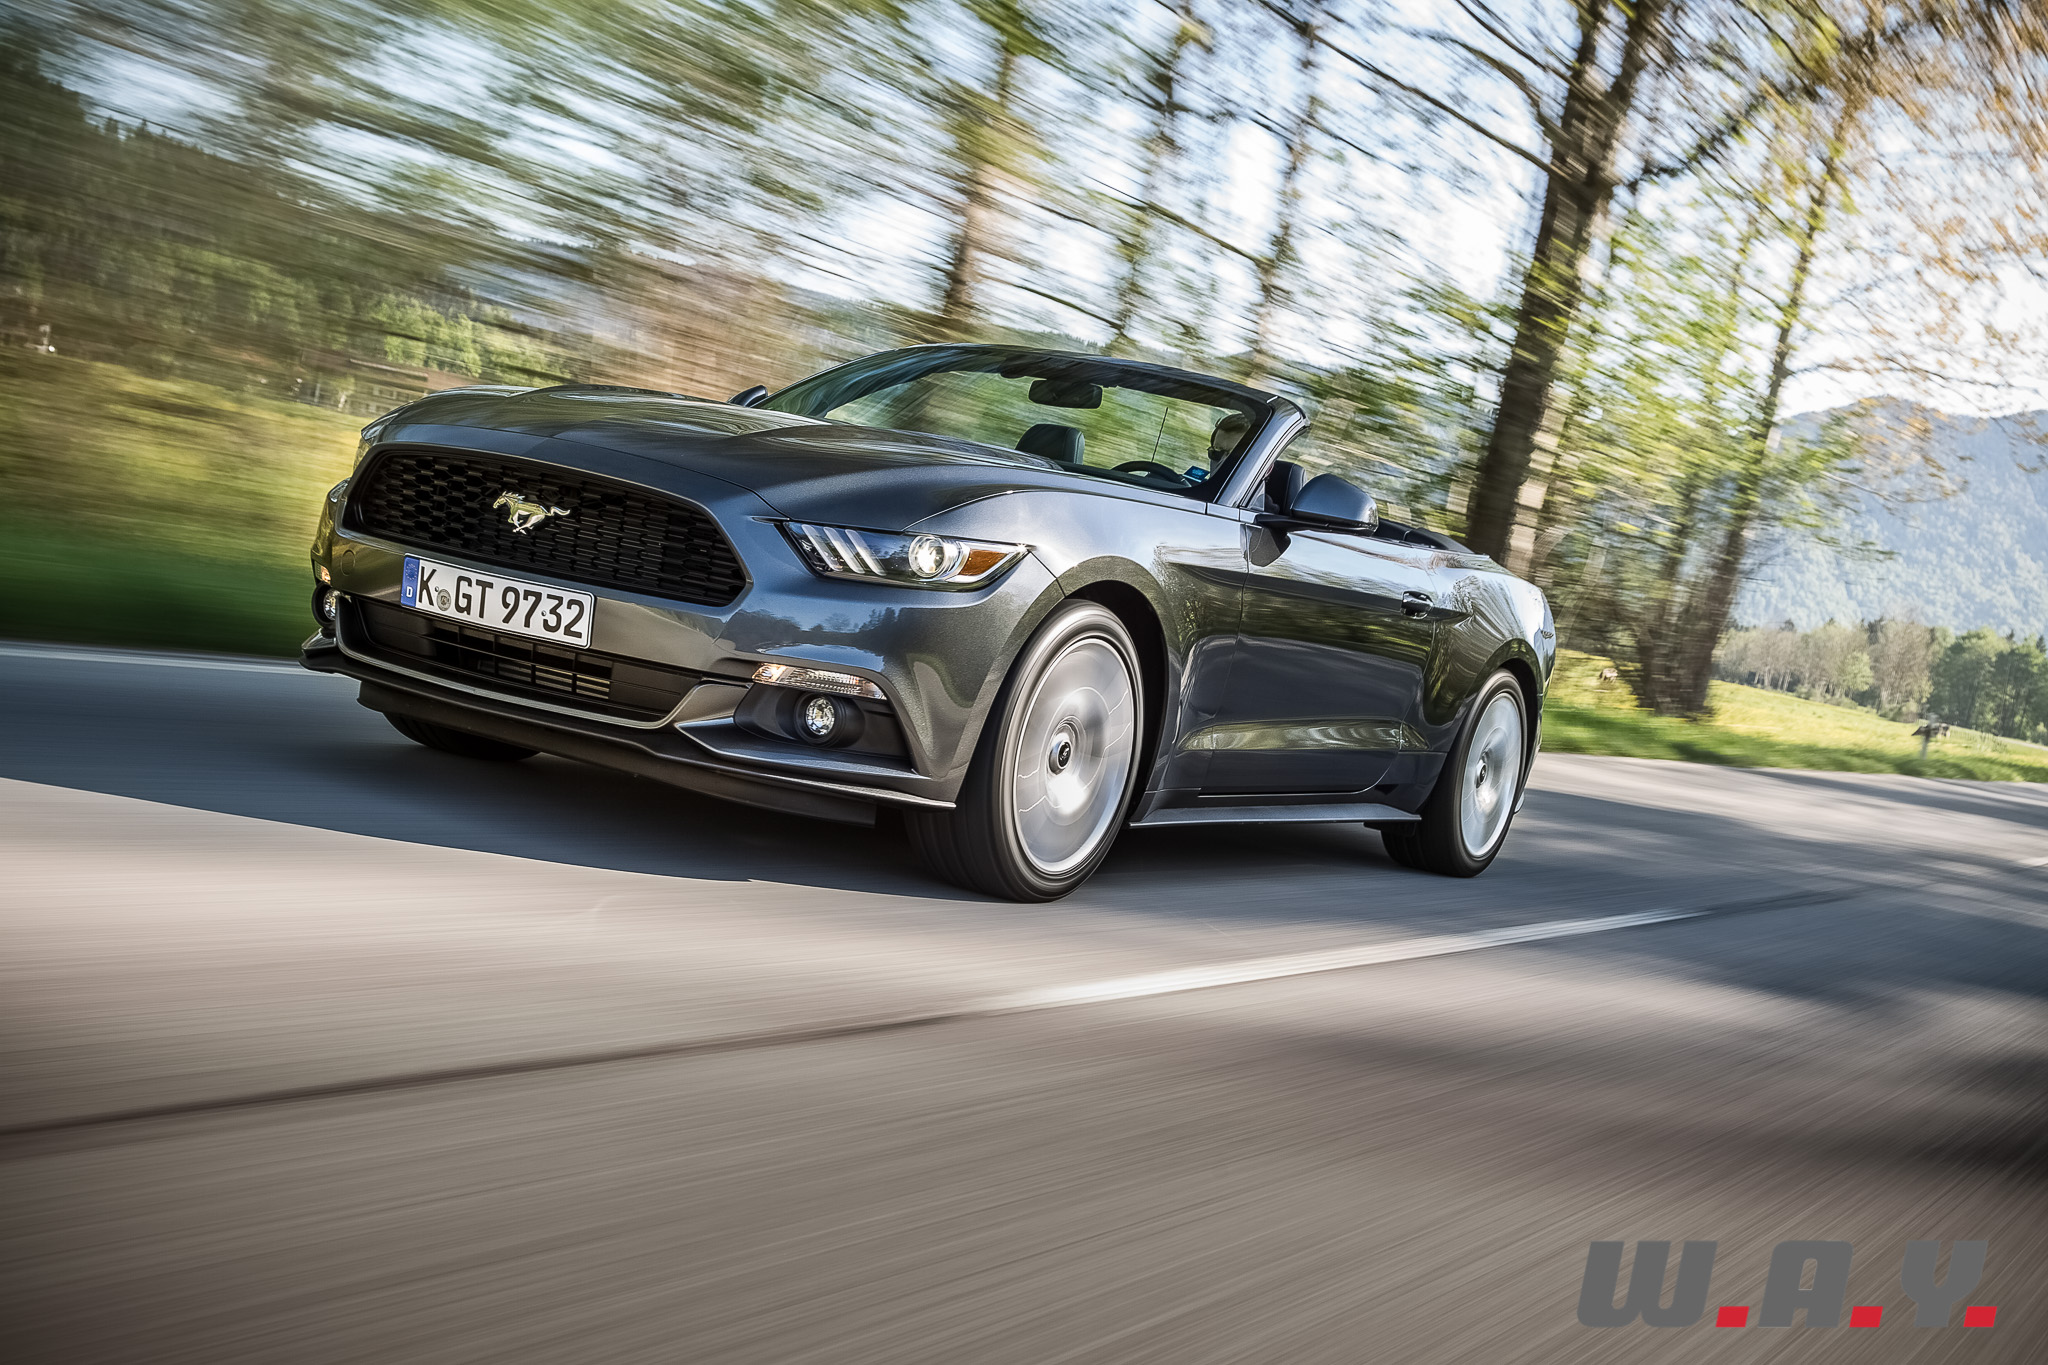 Mustang-09